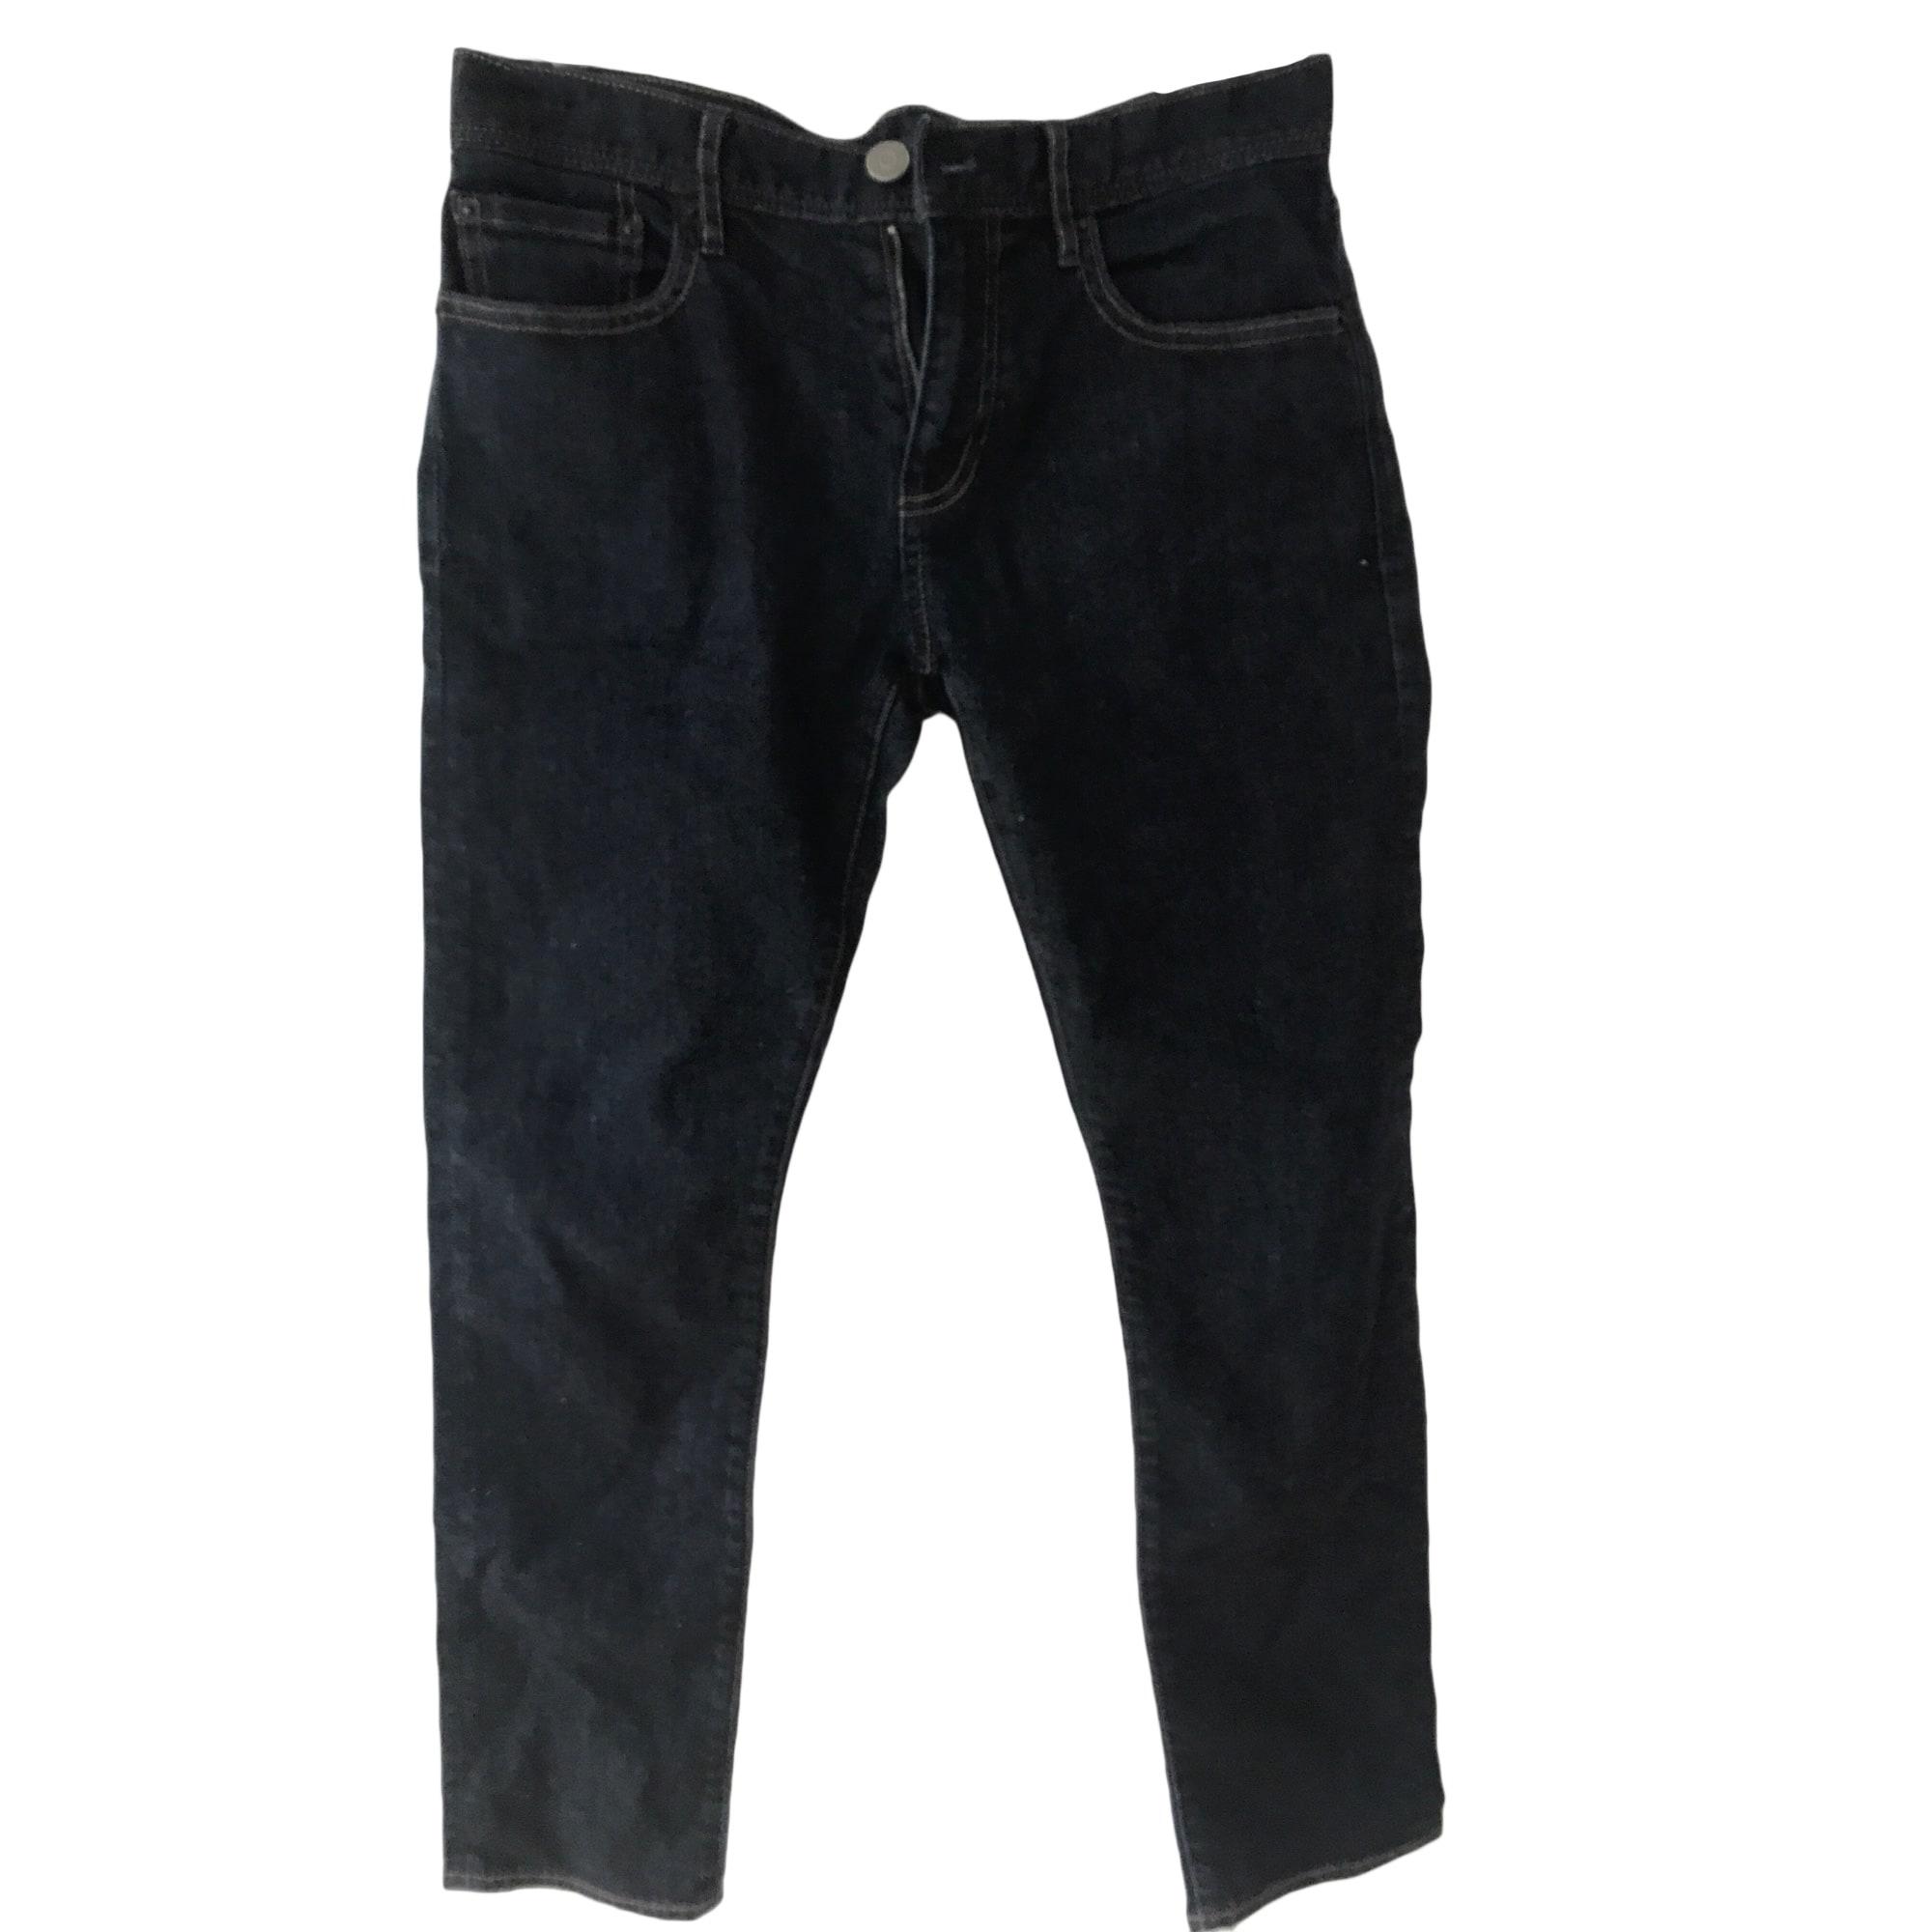 Exchange 40 W30 Armani t Slim Bleu 8086428 Jeans UxaWnEw